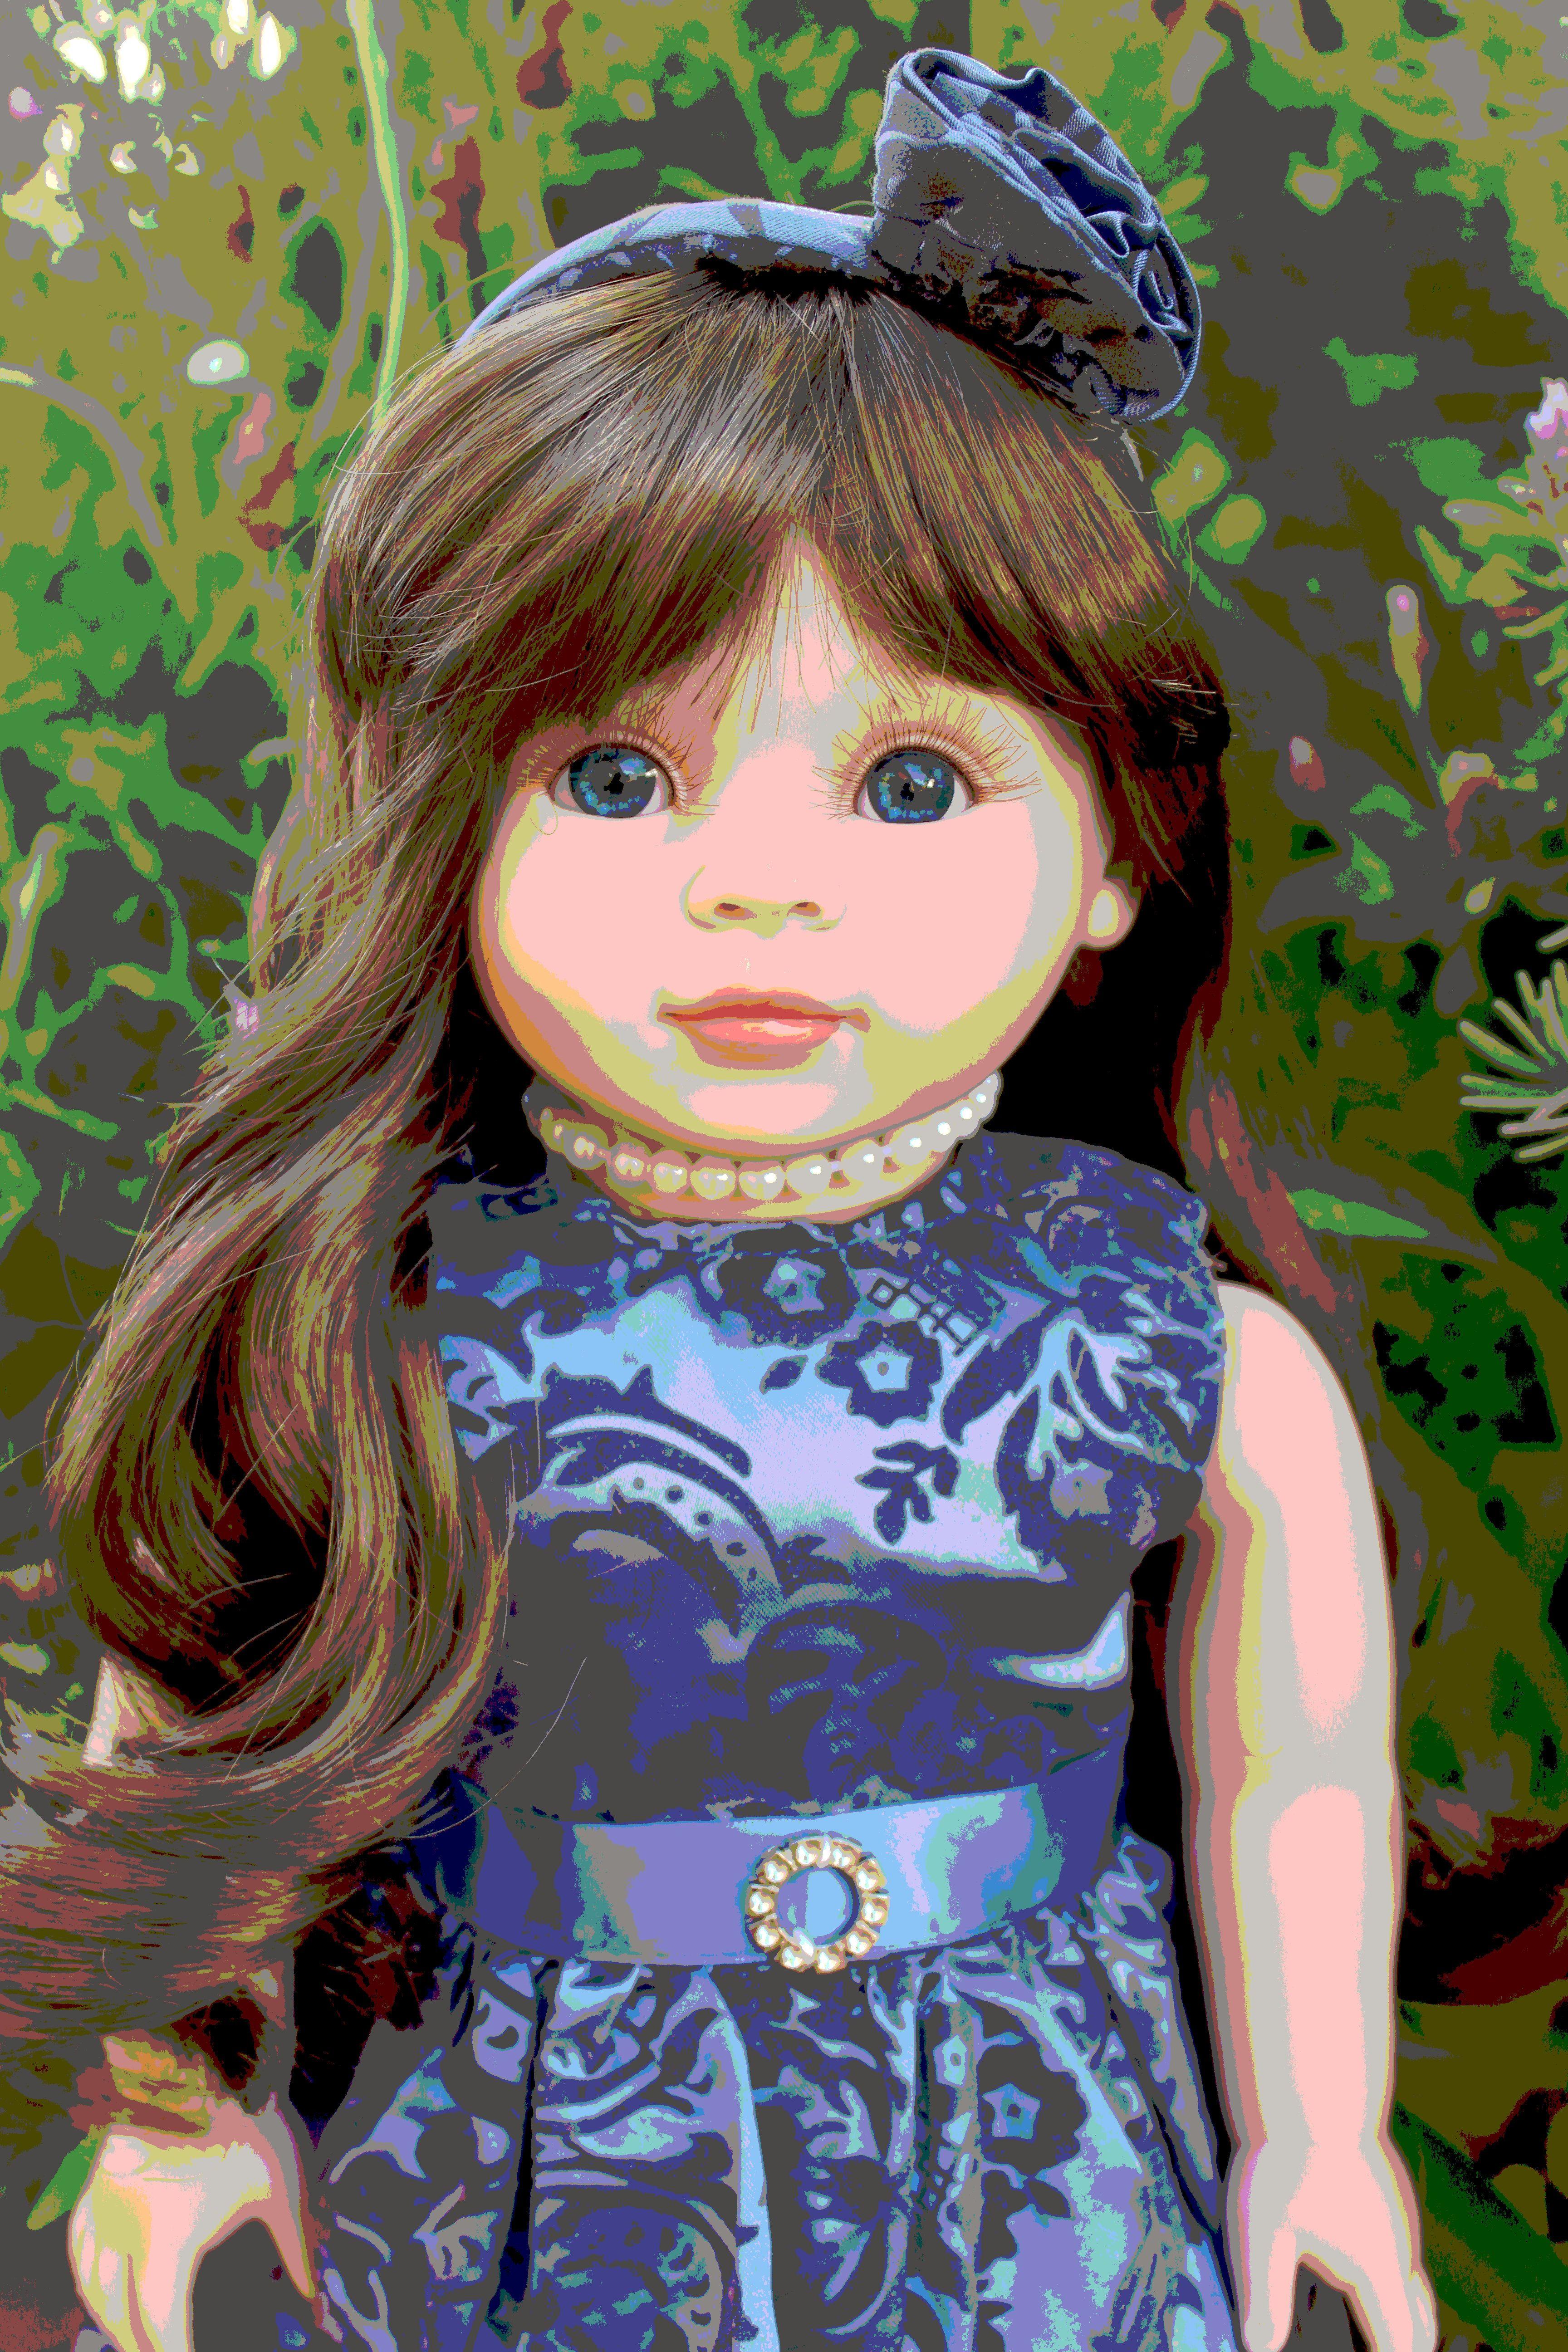 "Digital Art photo. Harmony Club Dolls 18"" Dolls www.harmonyclubdolls.com"